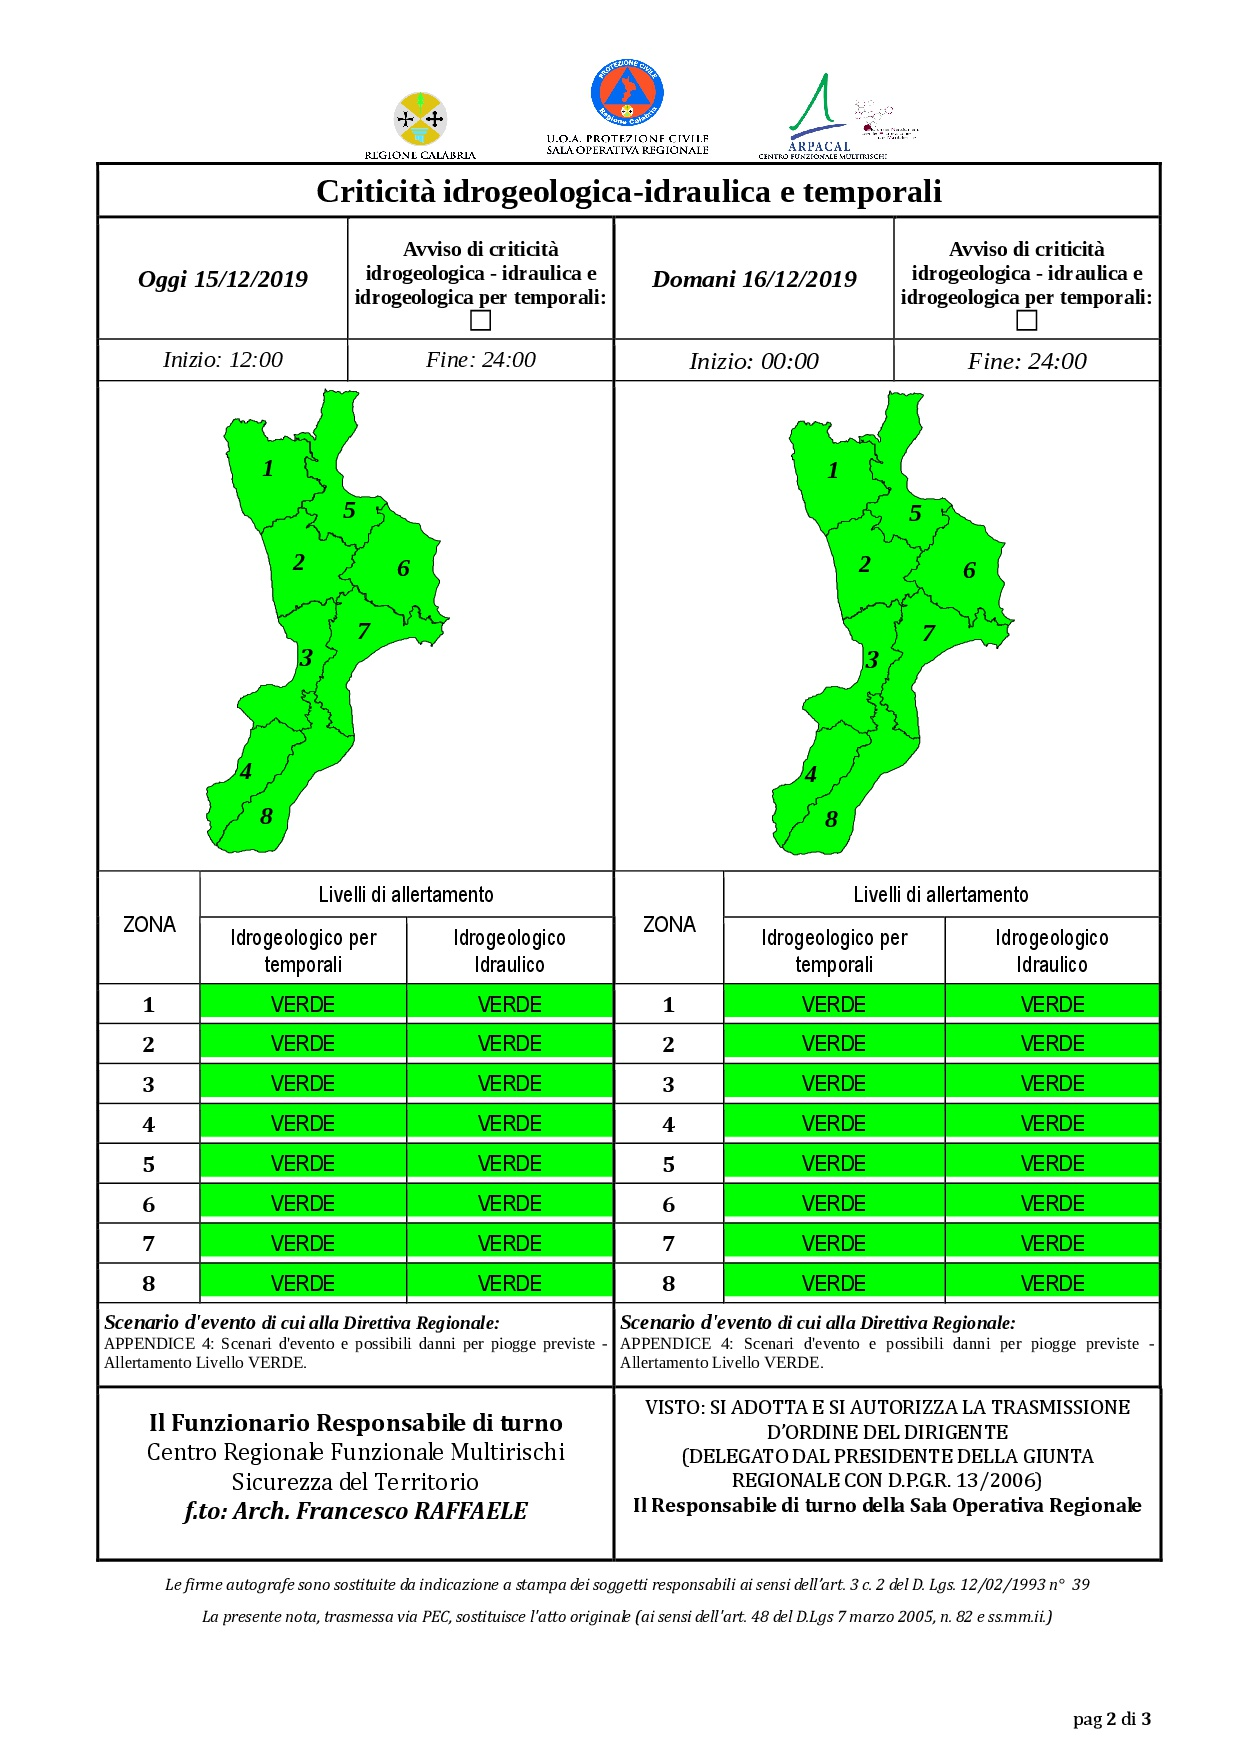 Criticità idrogeologica-idraulica e temporali in Calabria 15-12-2019